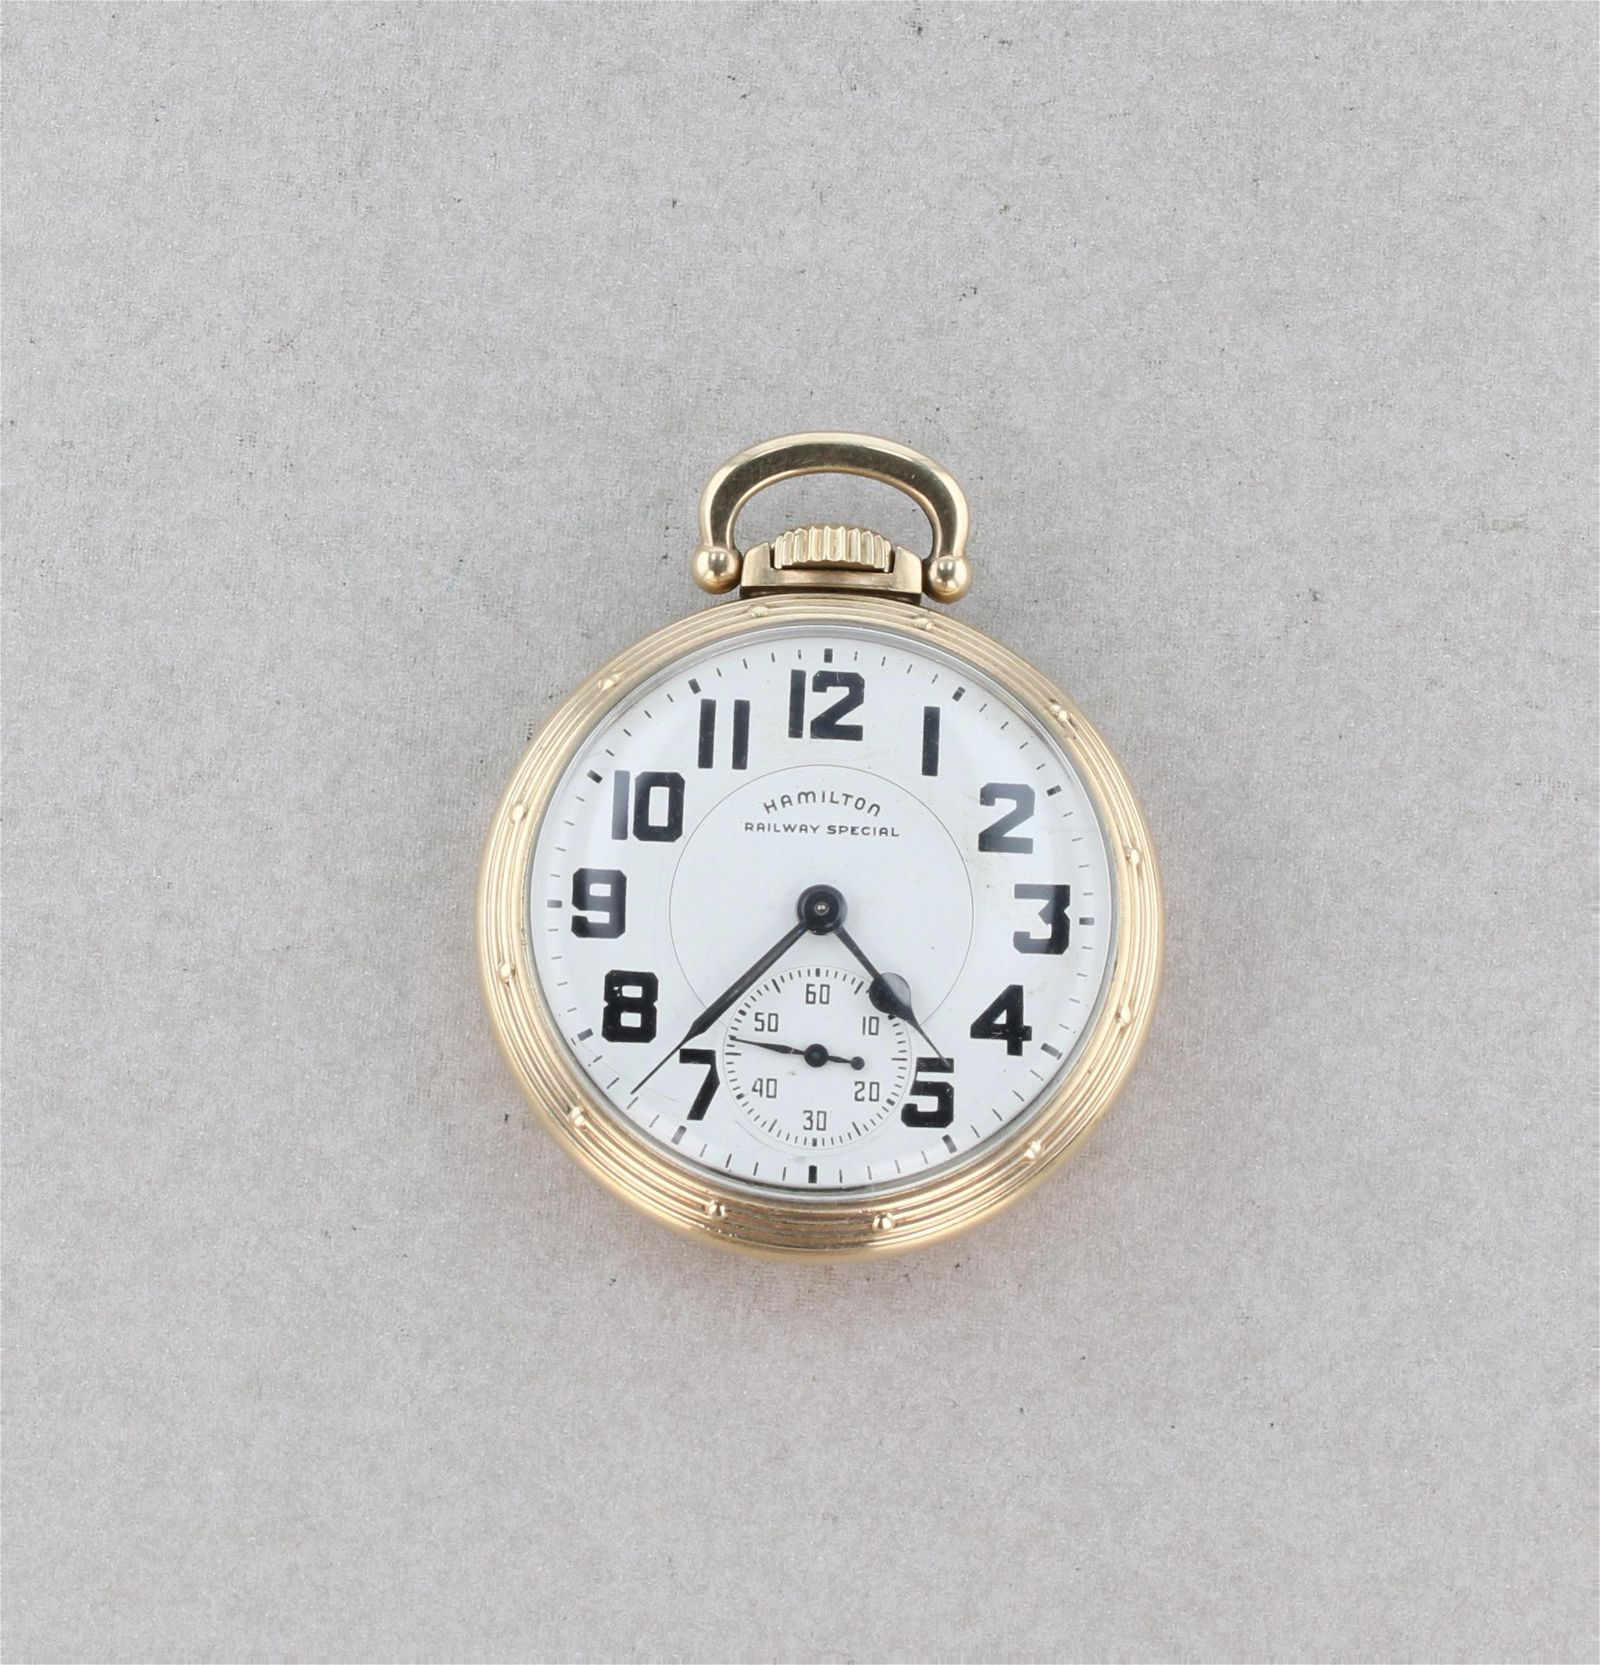 1949 Hamilton Railway Special Pocket Watch